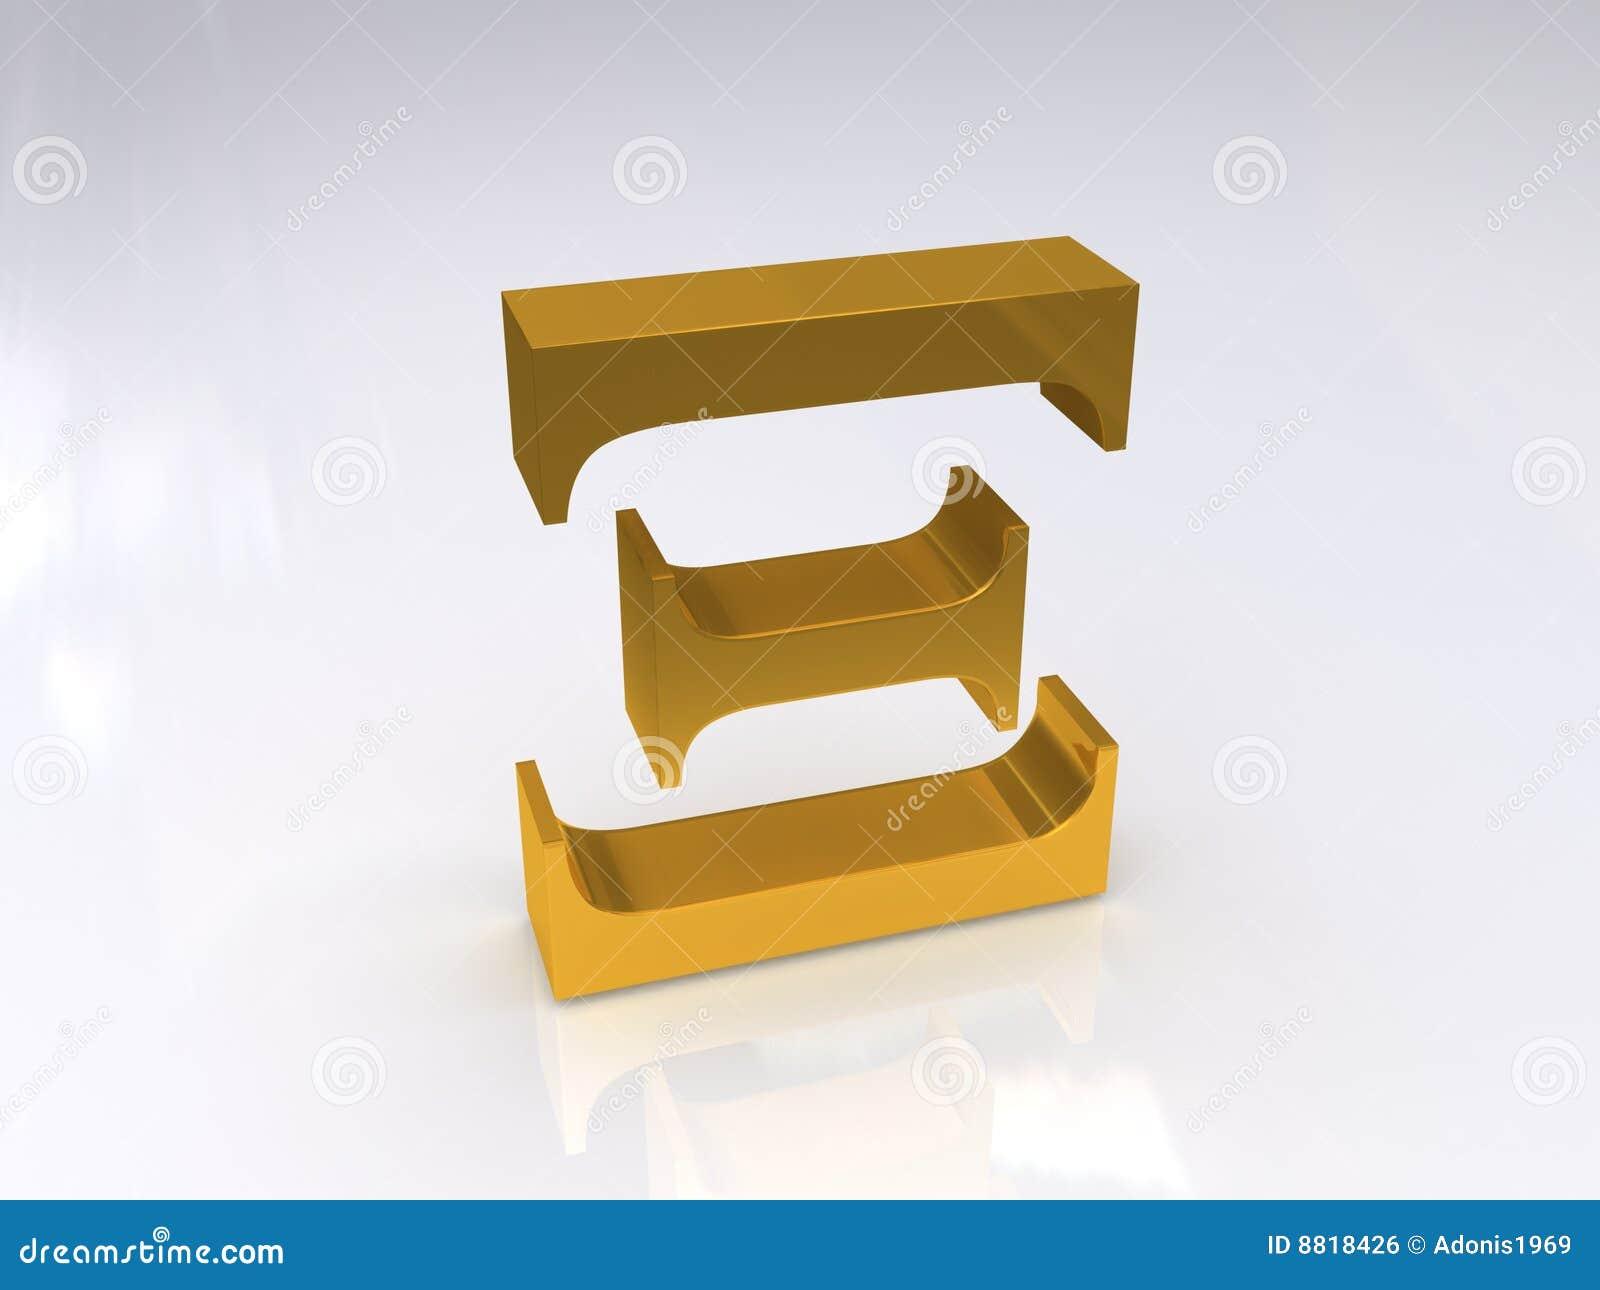 greek letter xi stock illustration illustration of alphabet 8818426